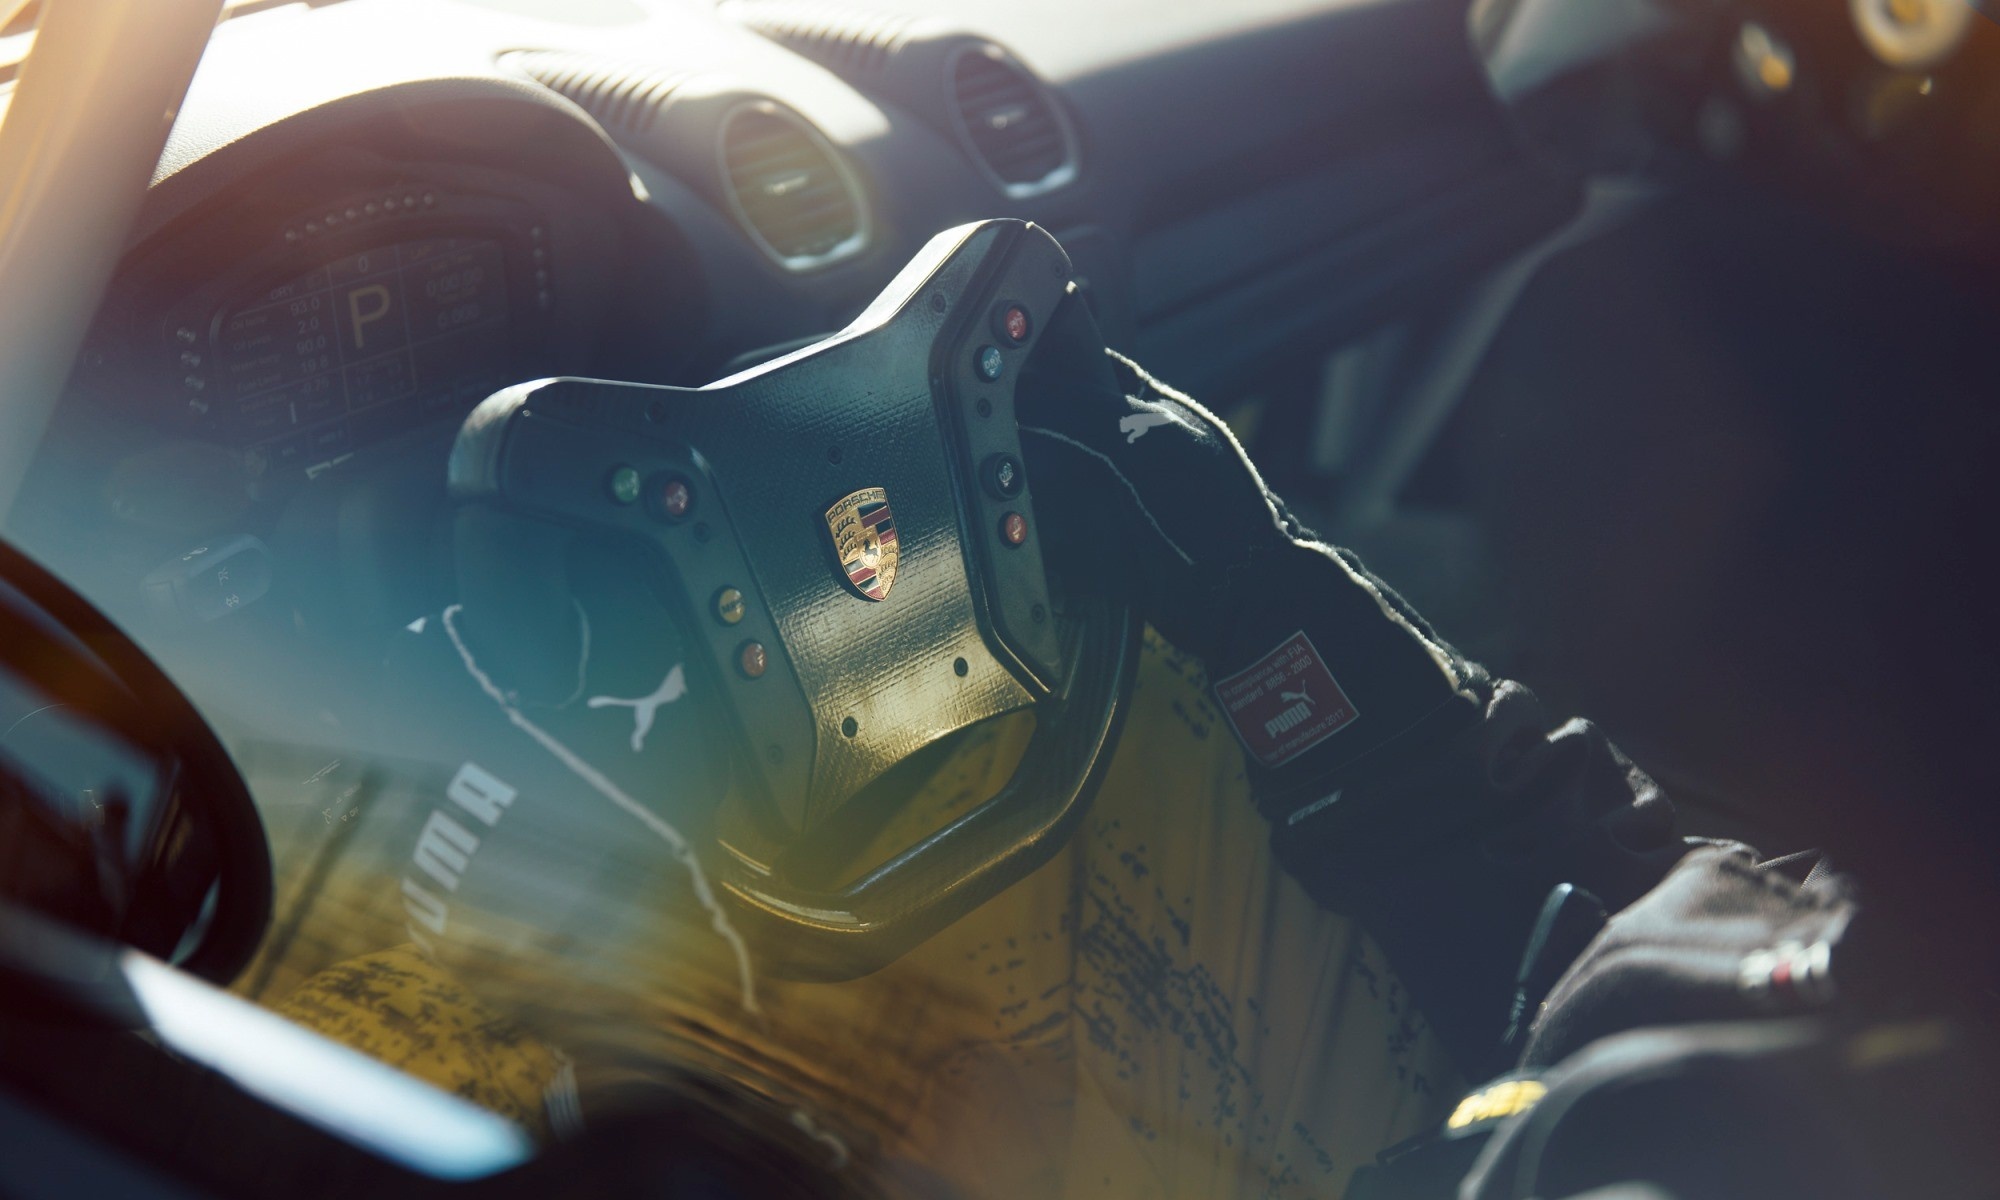 Porsche 718 Cayman GT4 Clubsport steering wheel